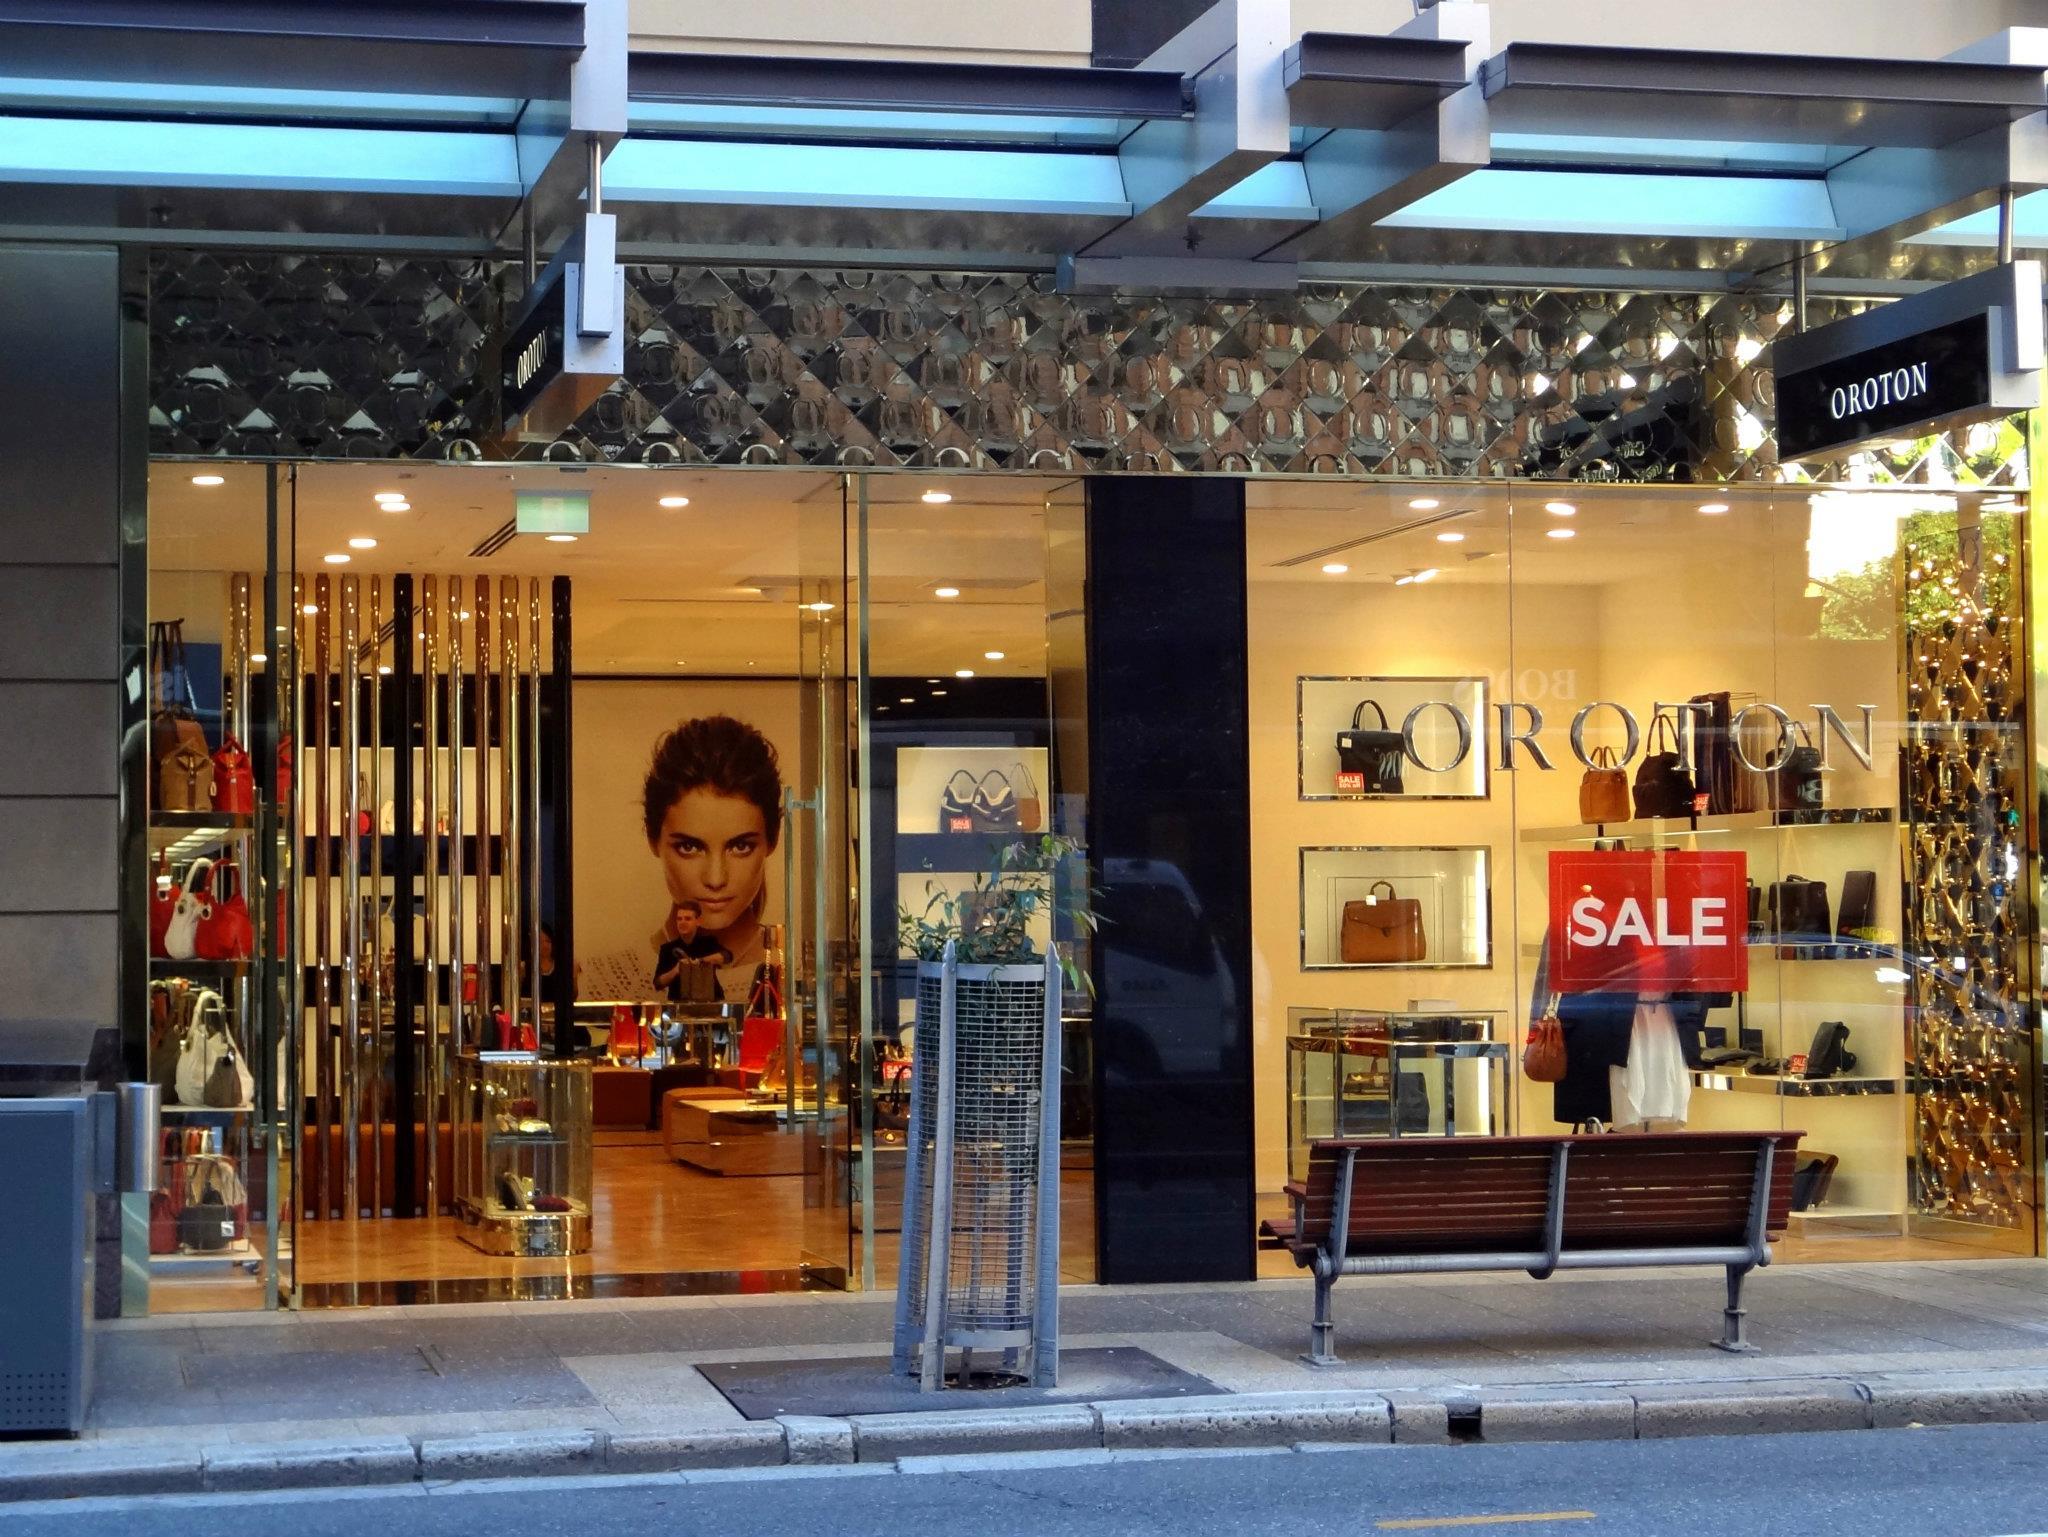 File Oroton Store Brisbane.jpg - Wikimedia Commons 9ecbdbef15c55